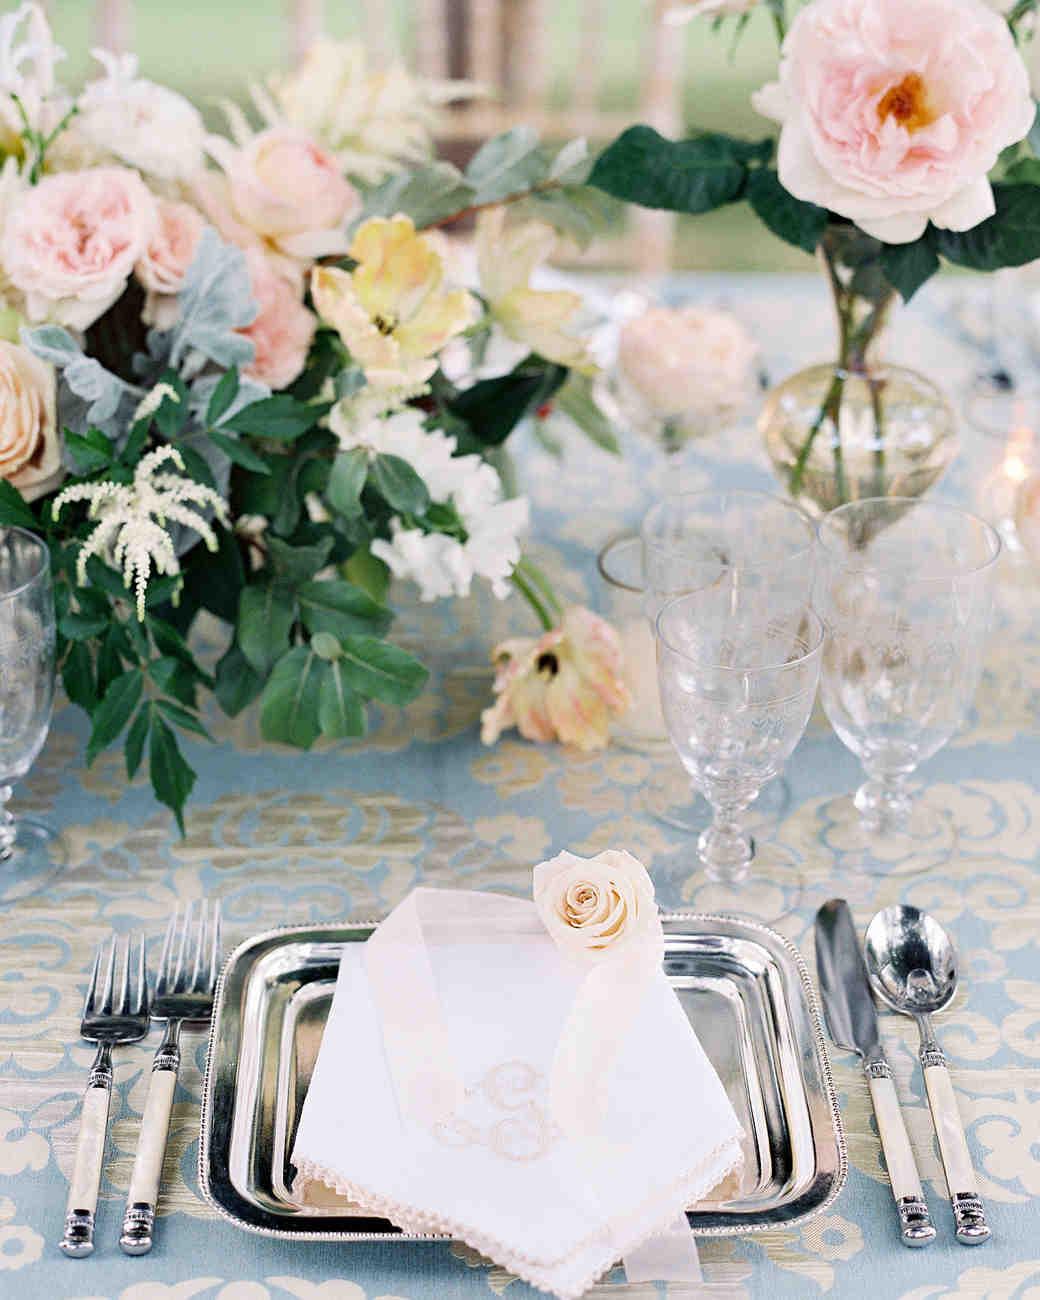 metallic wedding place setting silver plates